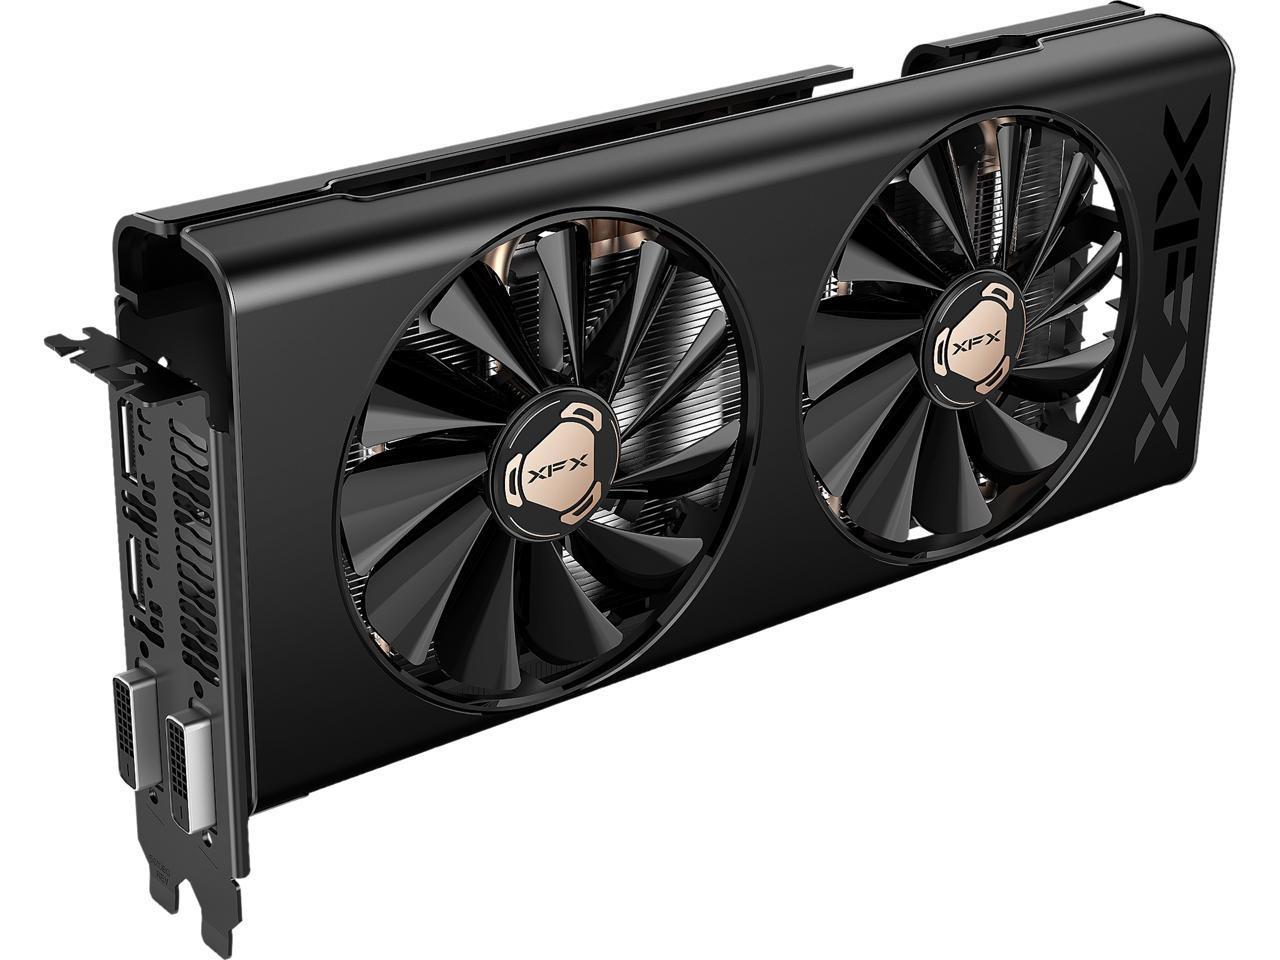 XFX Radeon RX 580 Double Dissipation 8GB GDDR5